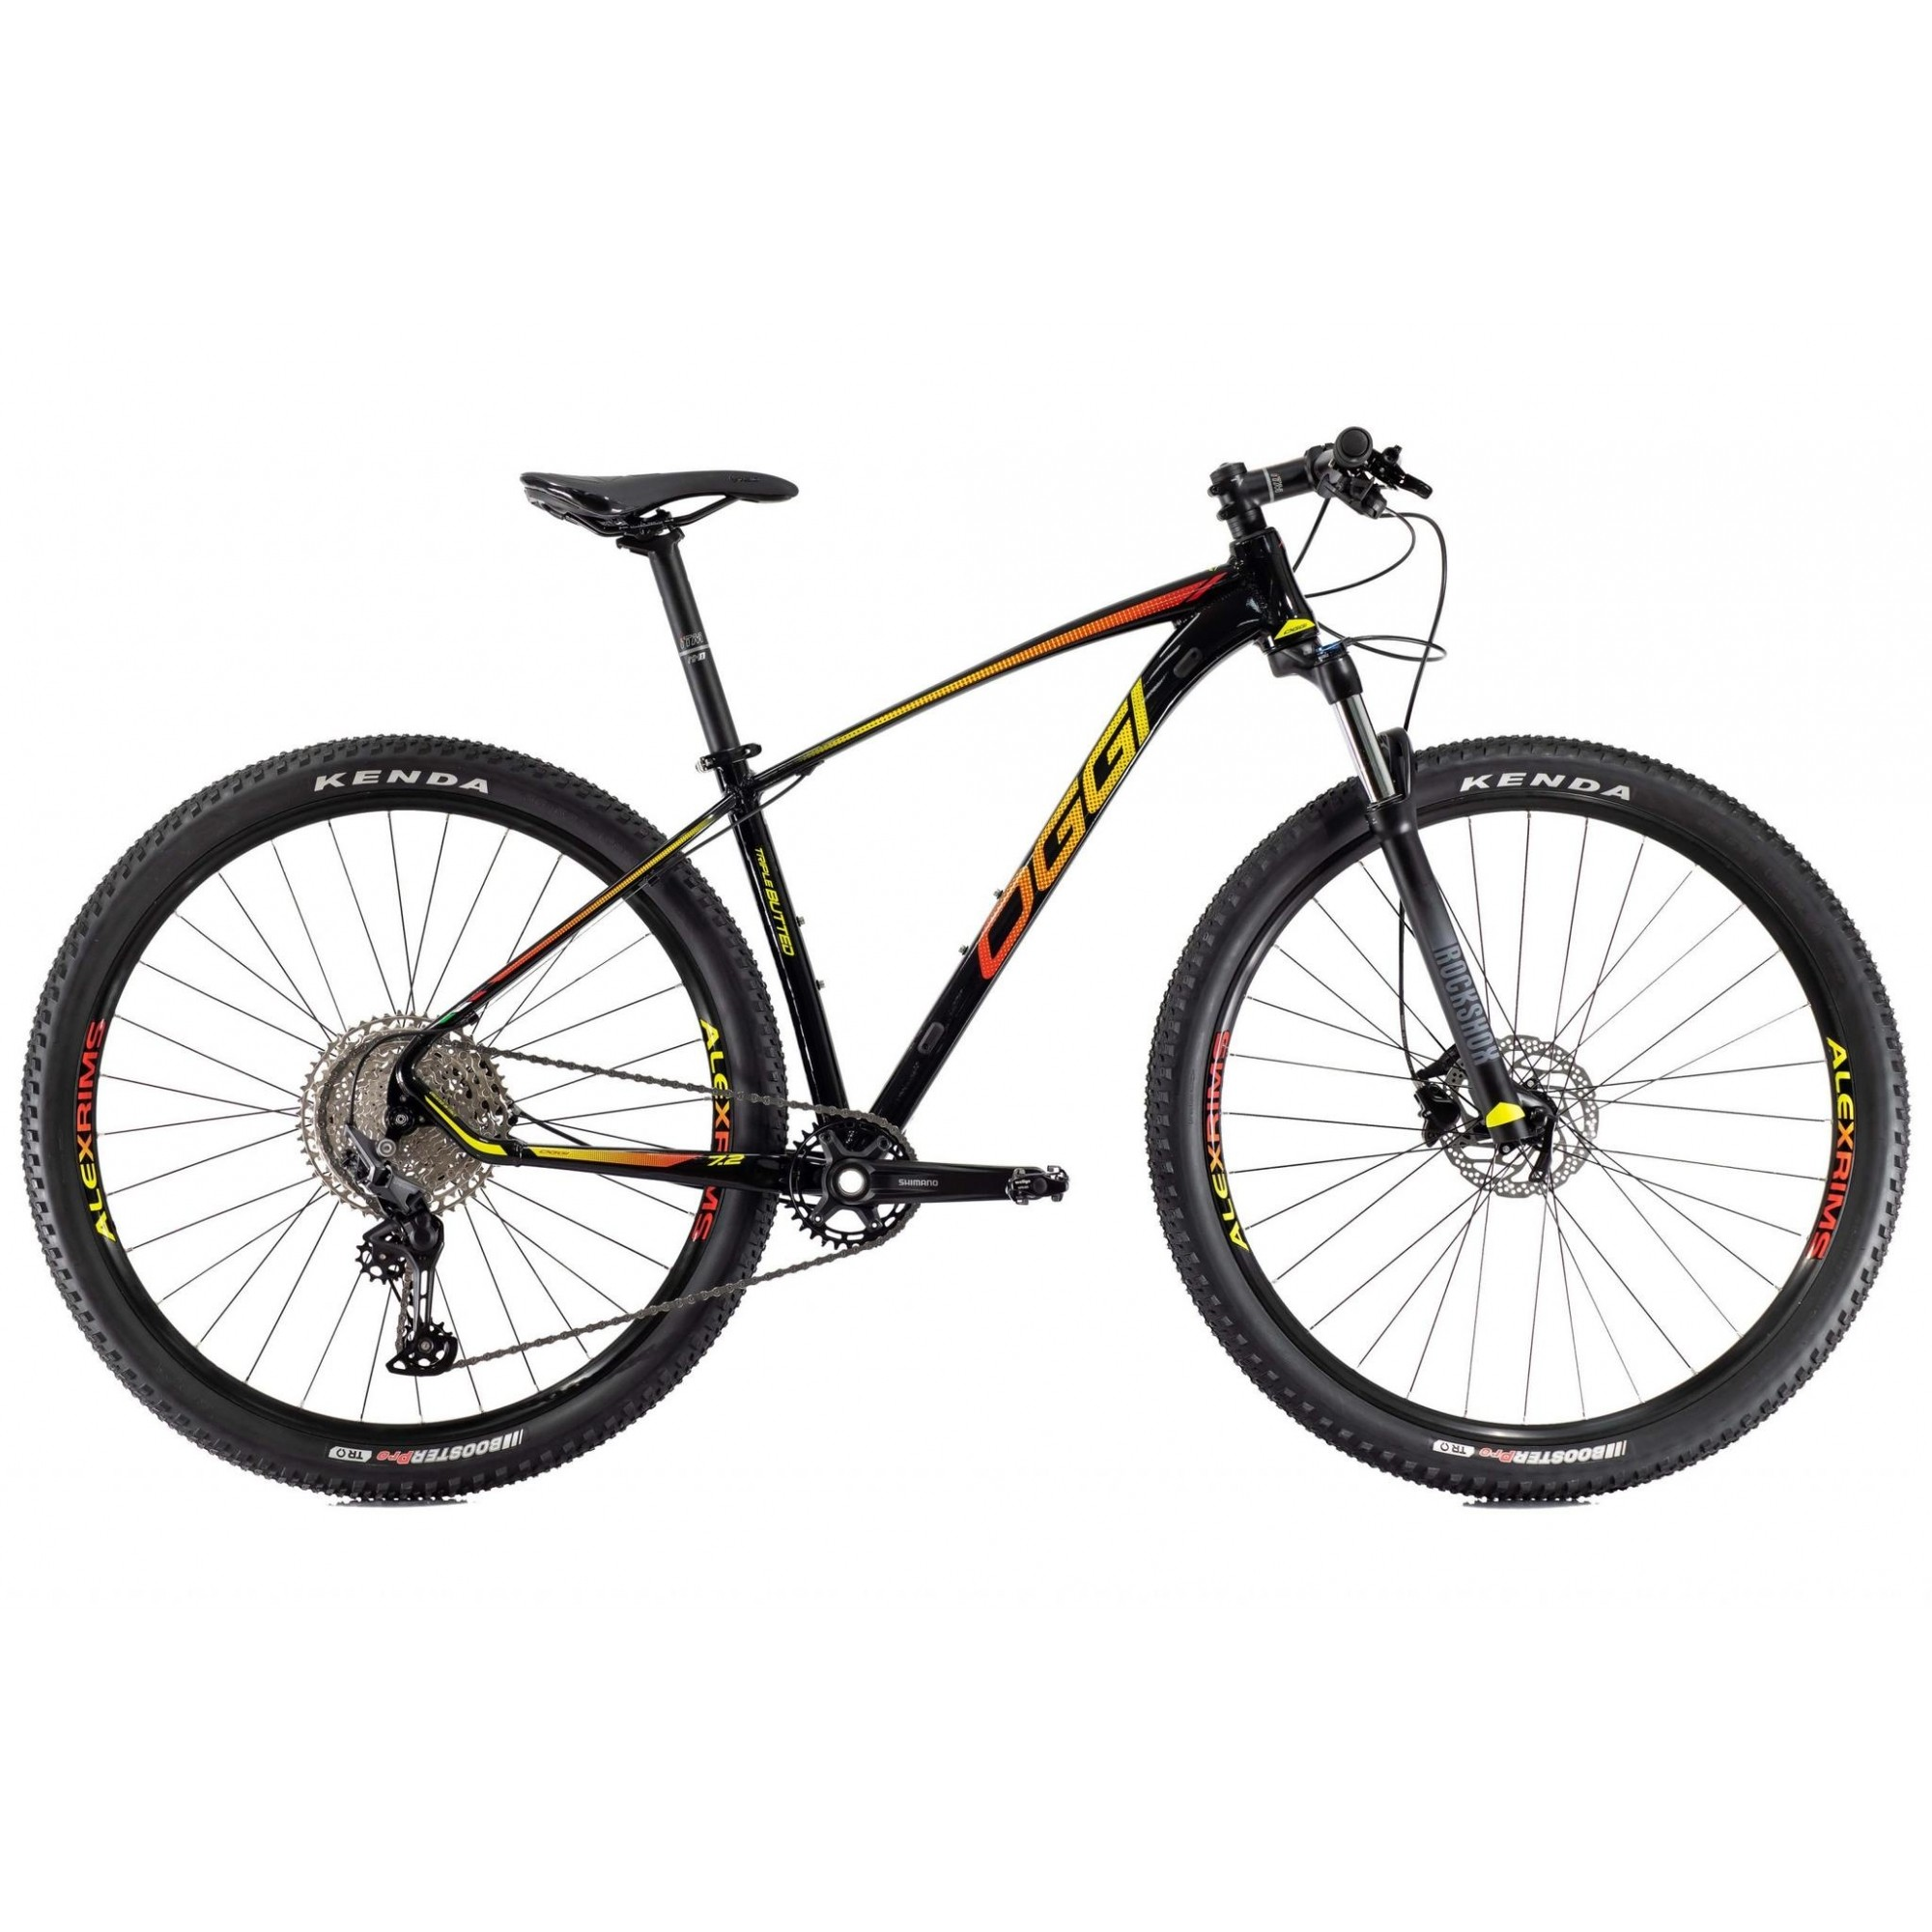 Bicicleta OGGI Big Wheel 7.2 2021 - 11v Shimano Deore - Freio Shimano Hidráulico - Preto/Amarelo/Vermelho